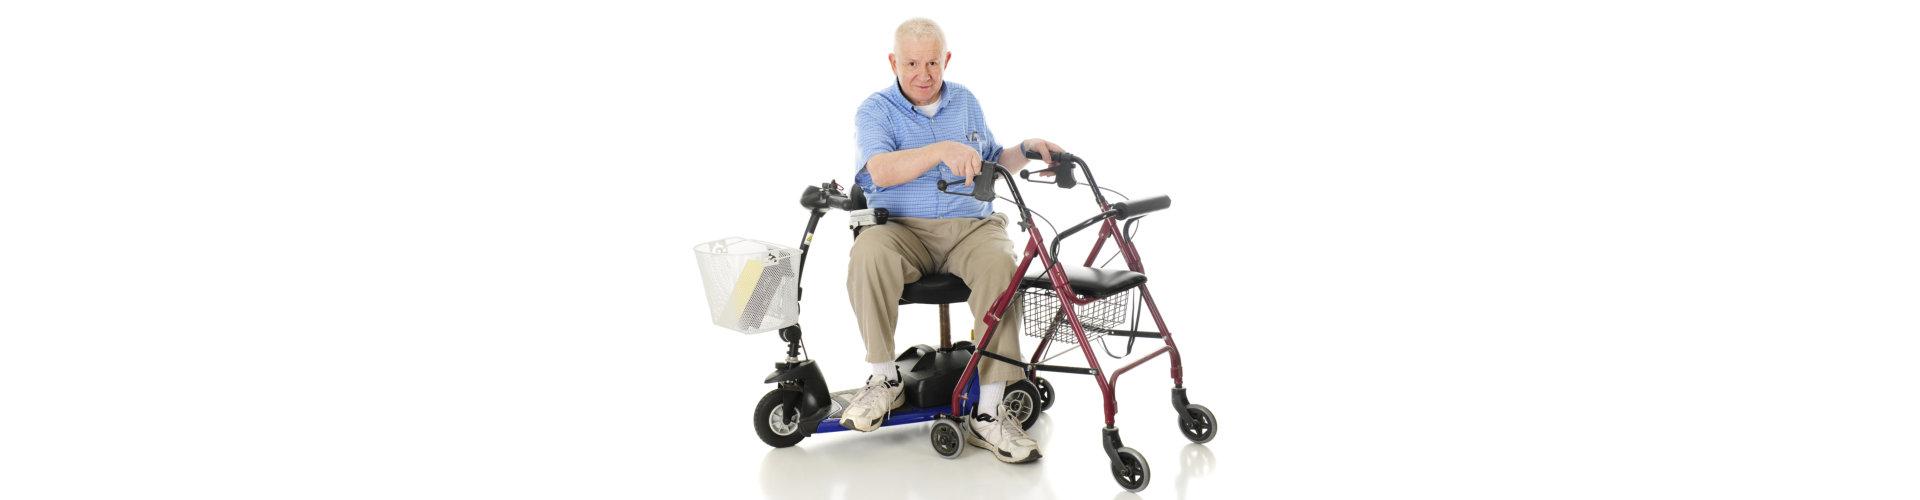 senior man sitting on power scooter